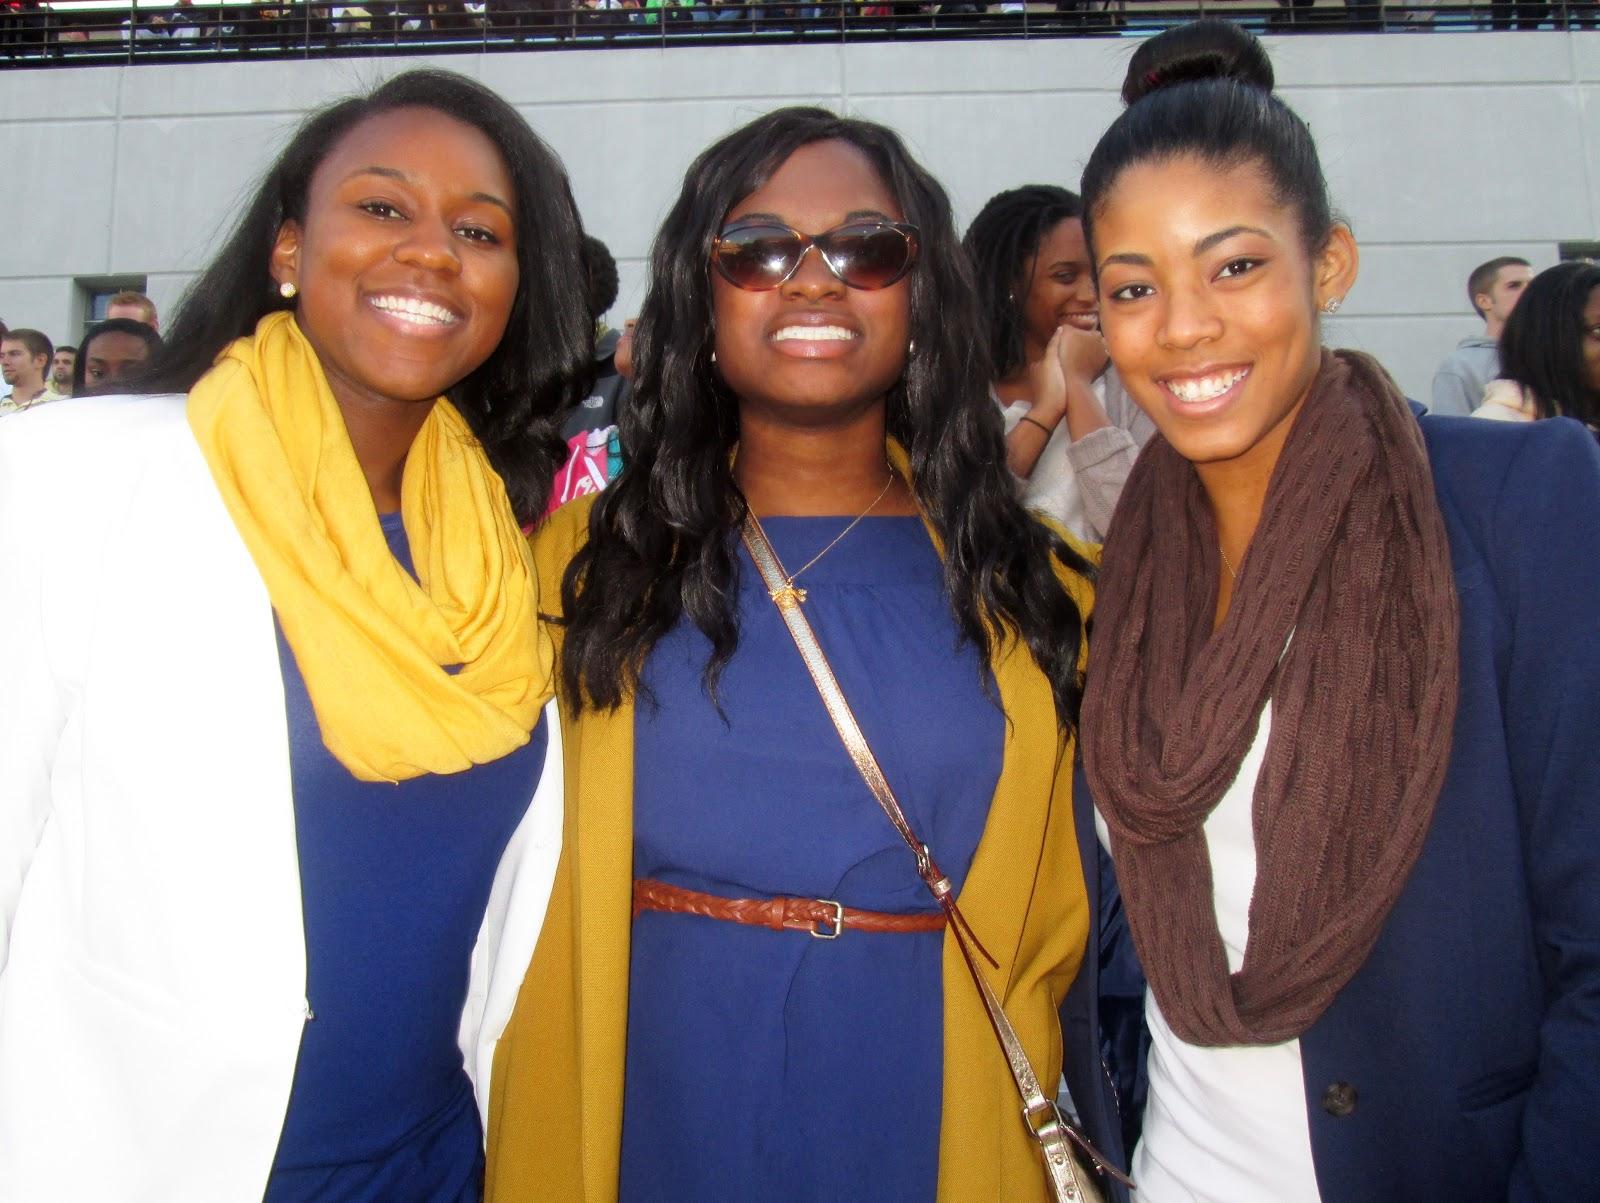 bbdf58edb4b Real College Student of Atlanta  Congrats